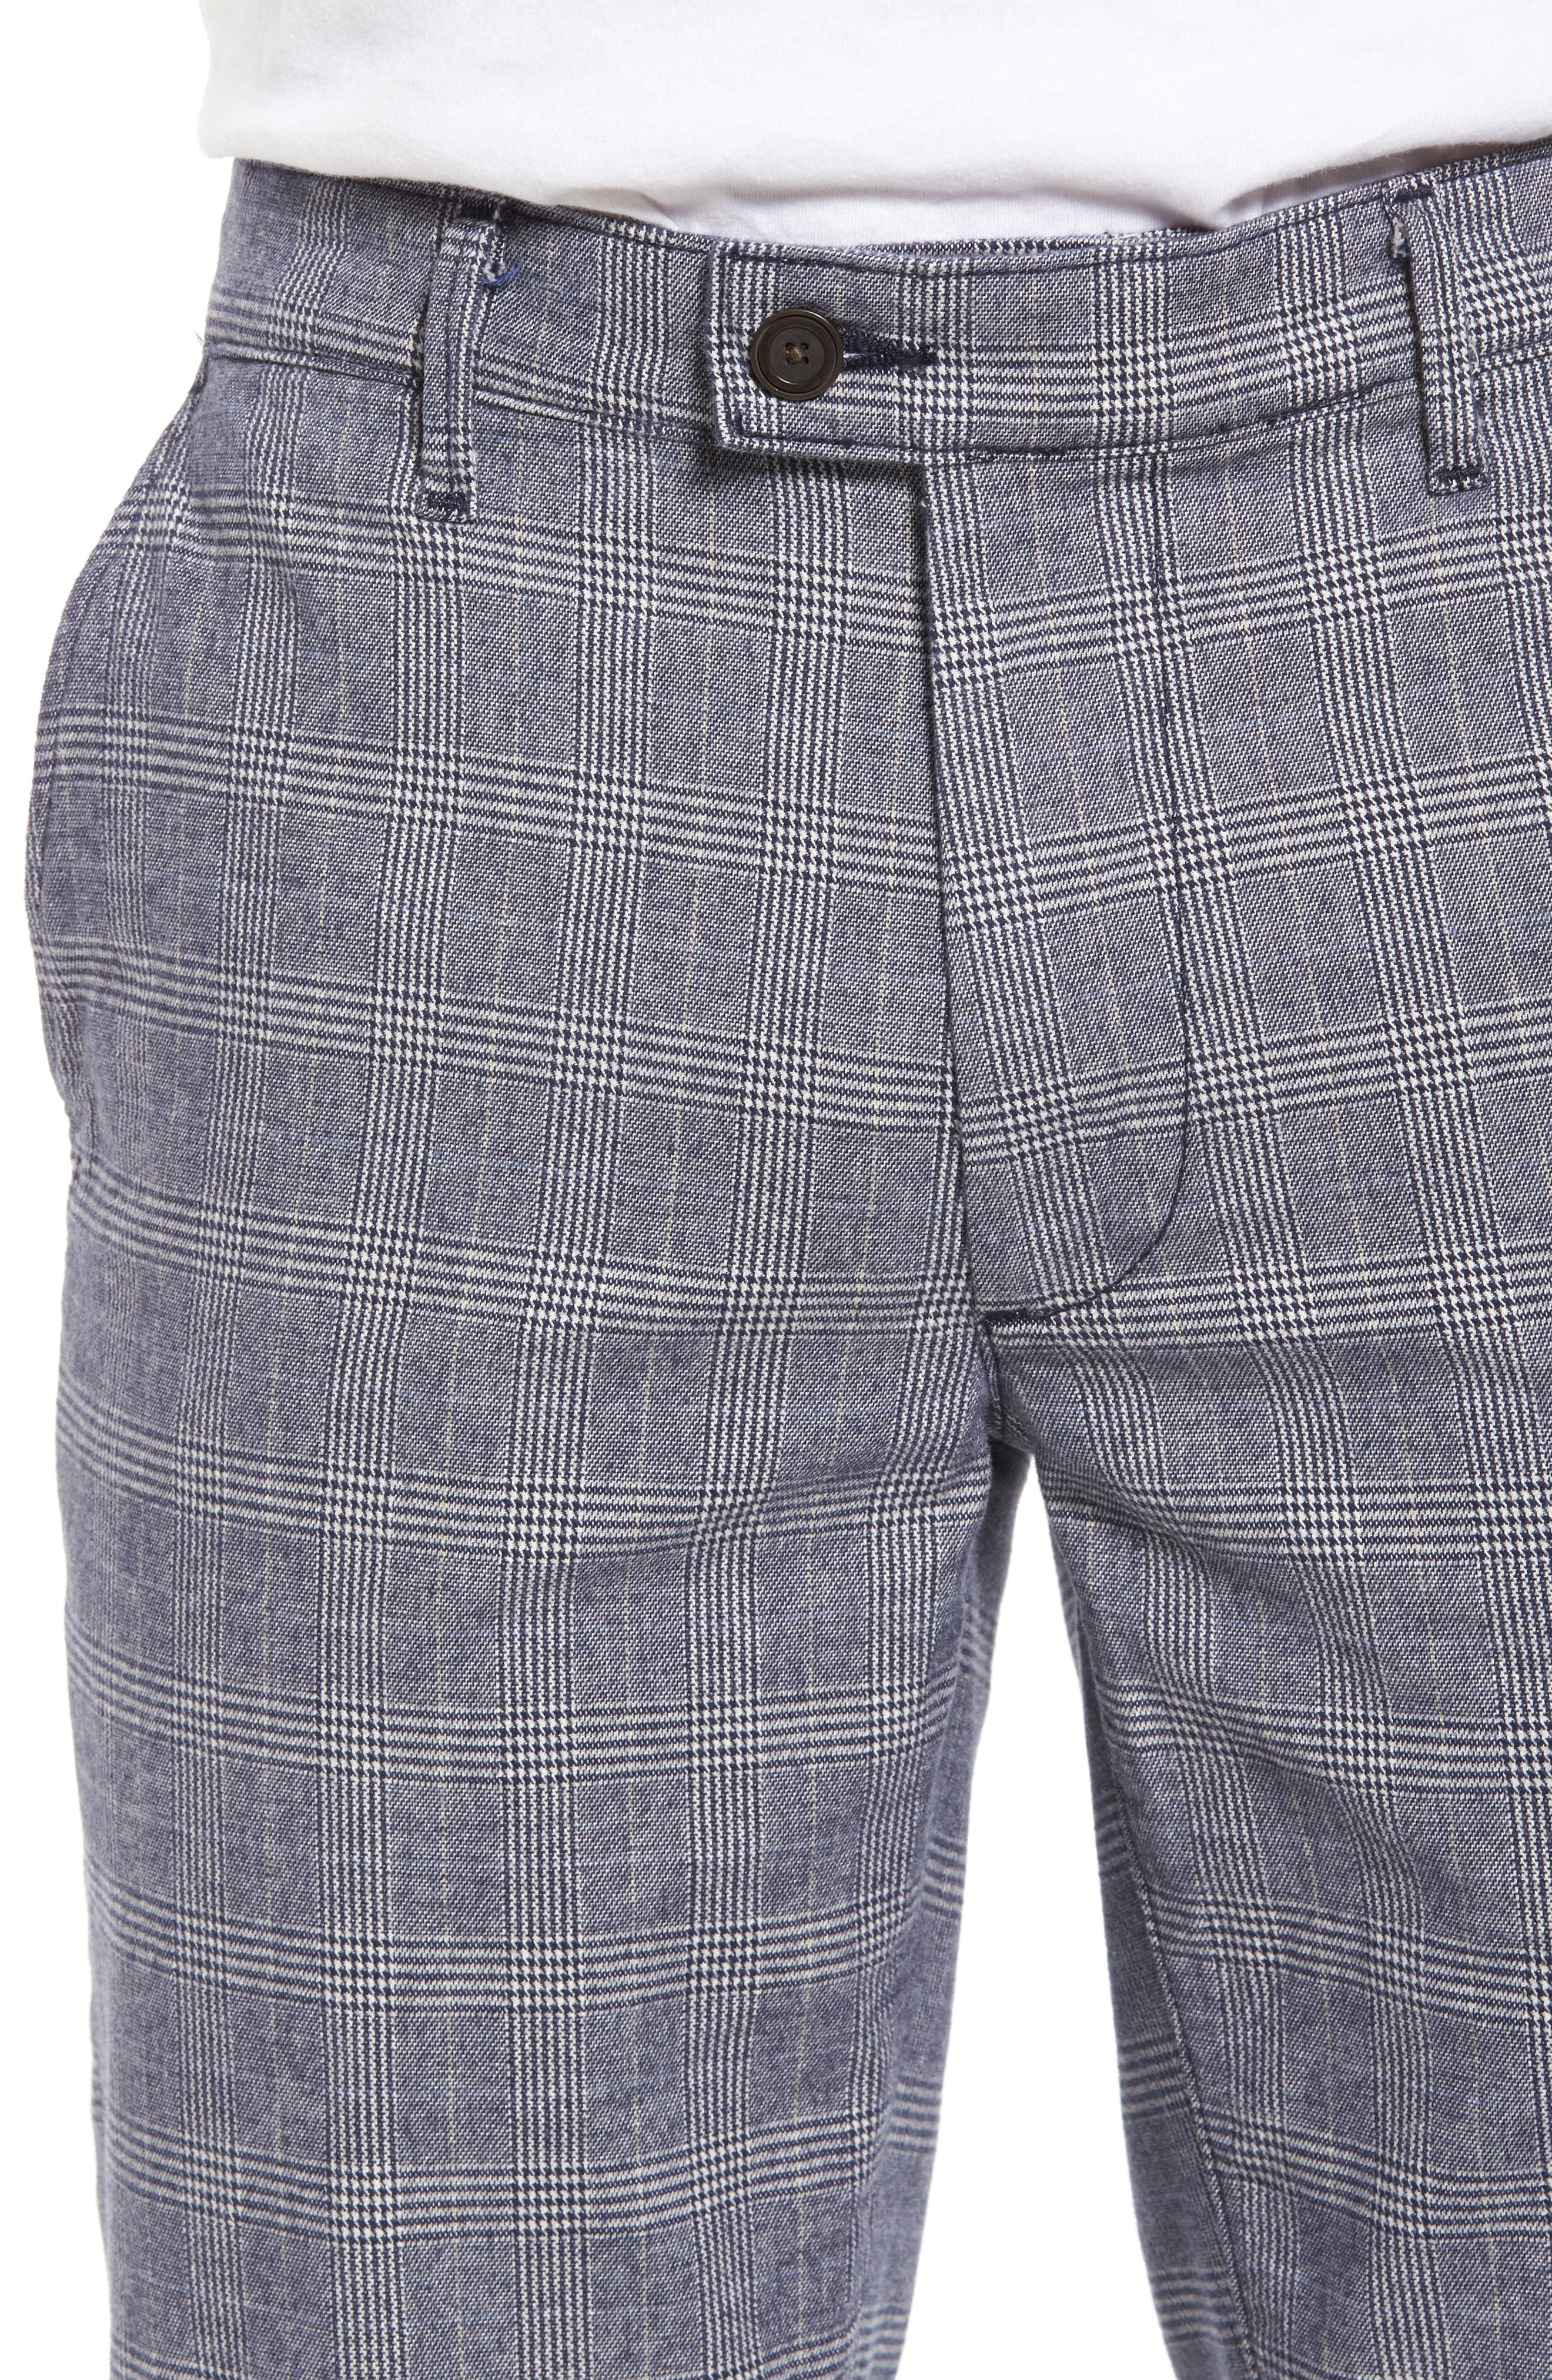 Marshall Slim Fit Pants,                             Alternate thumbnail 12, color,